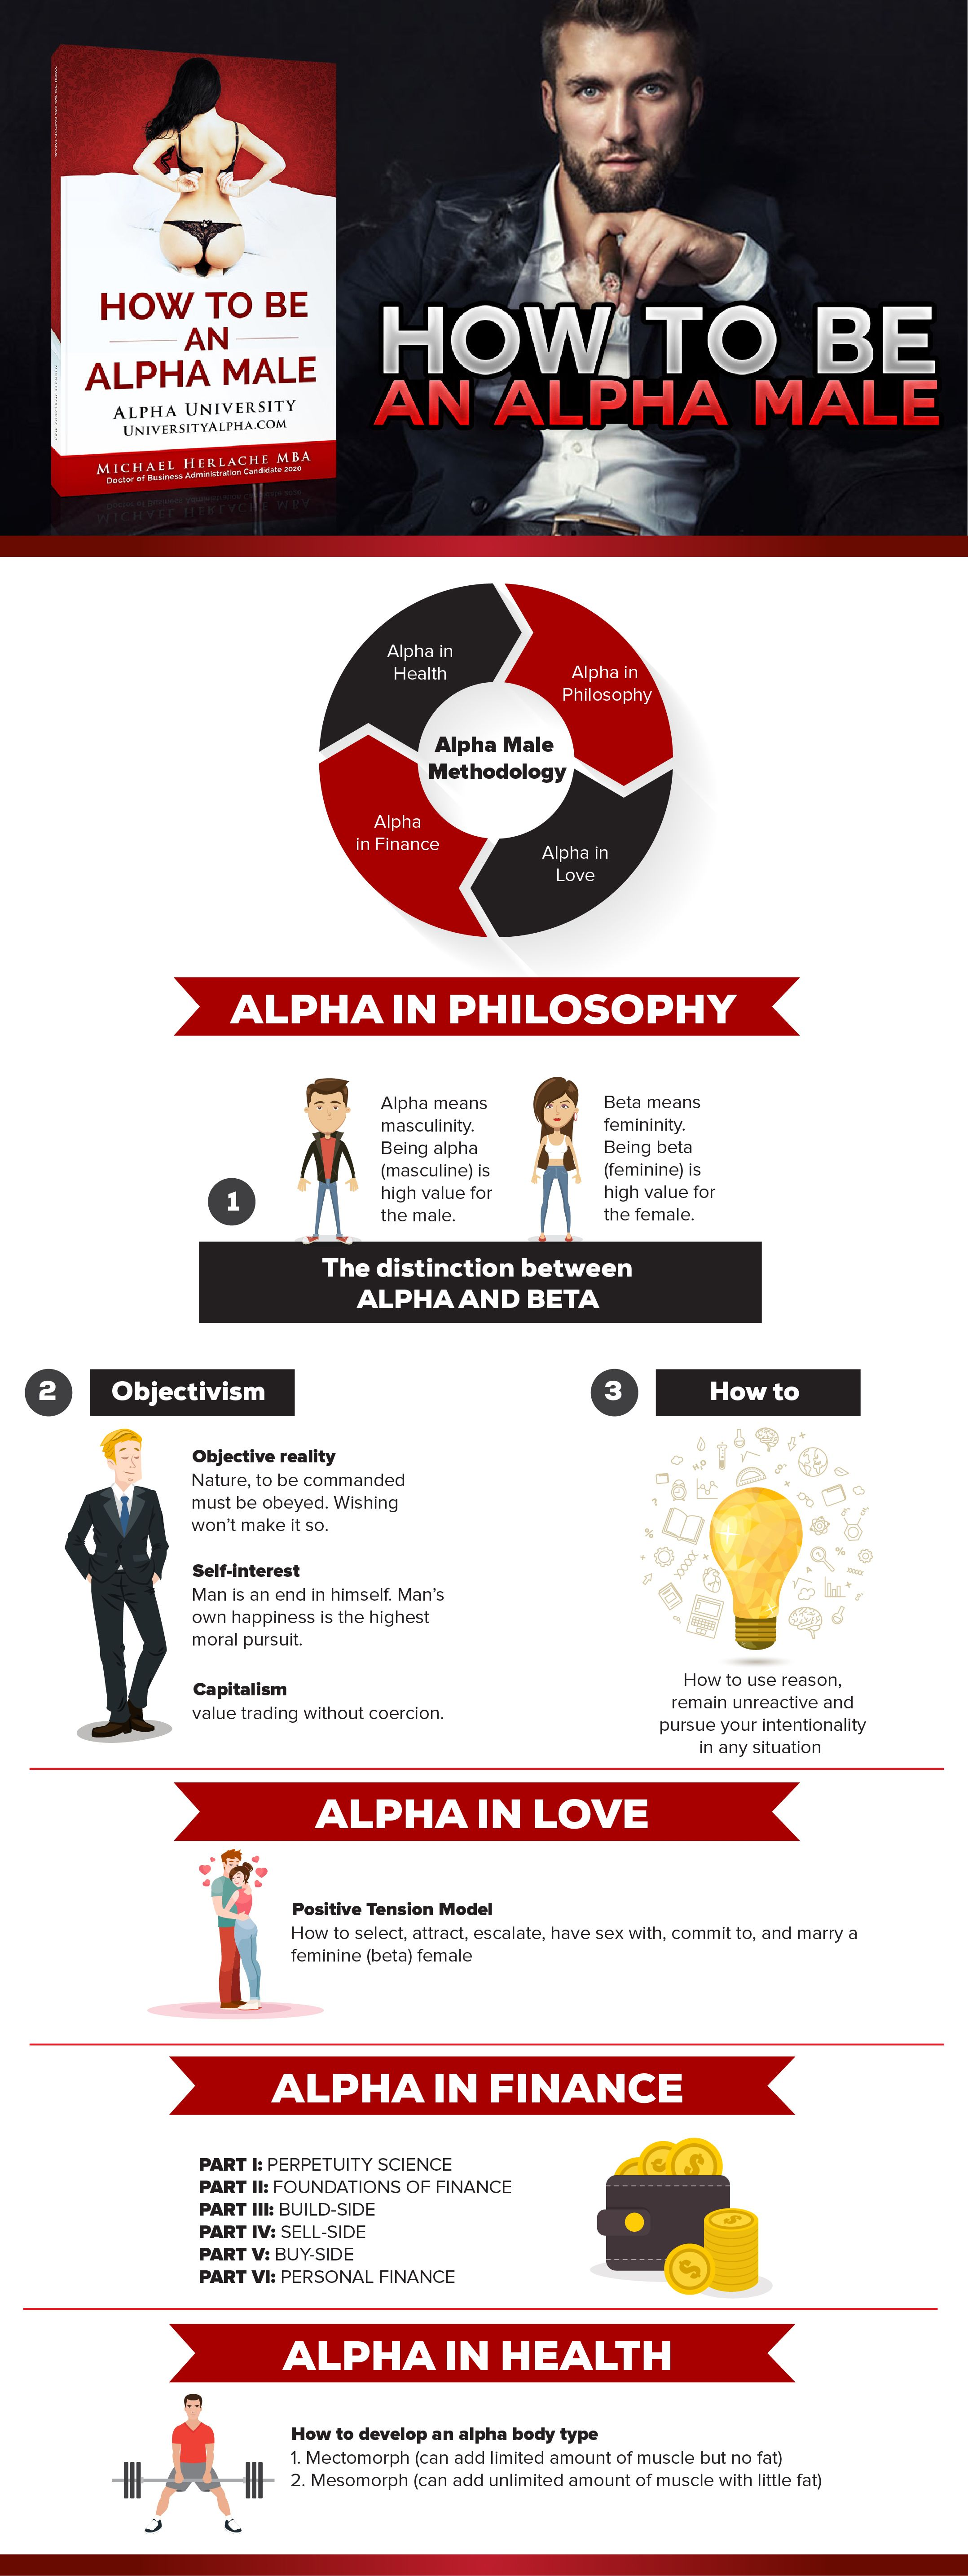 alpha male dating characteristics